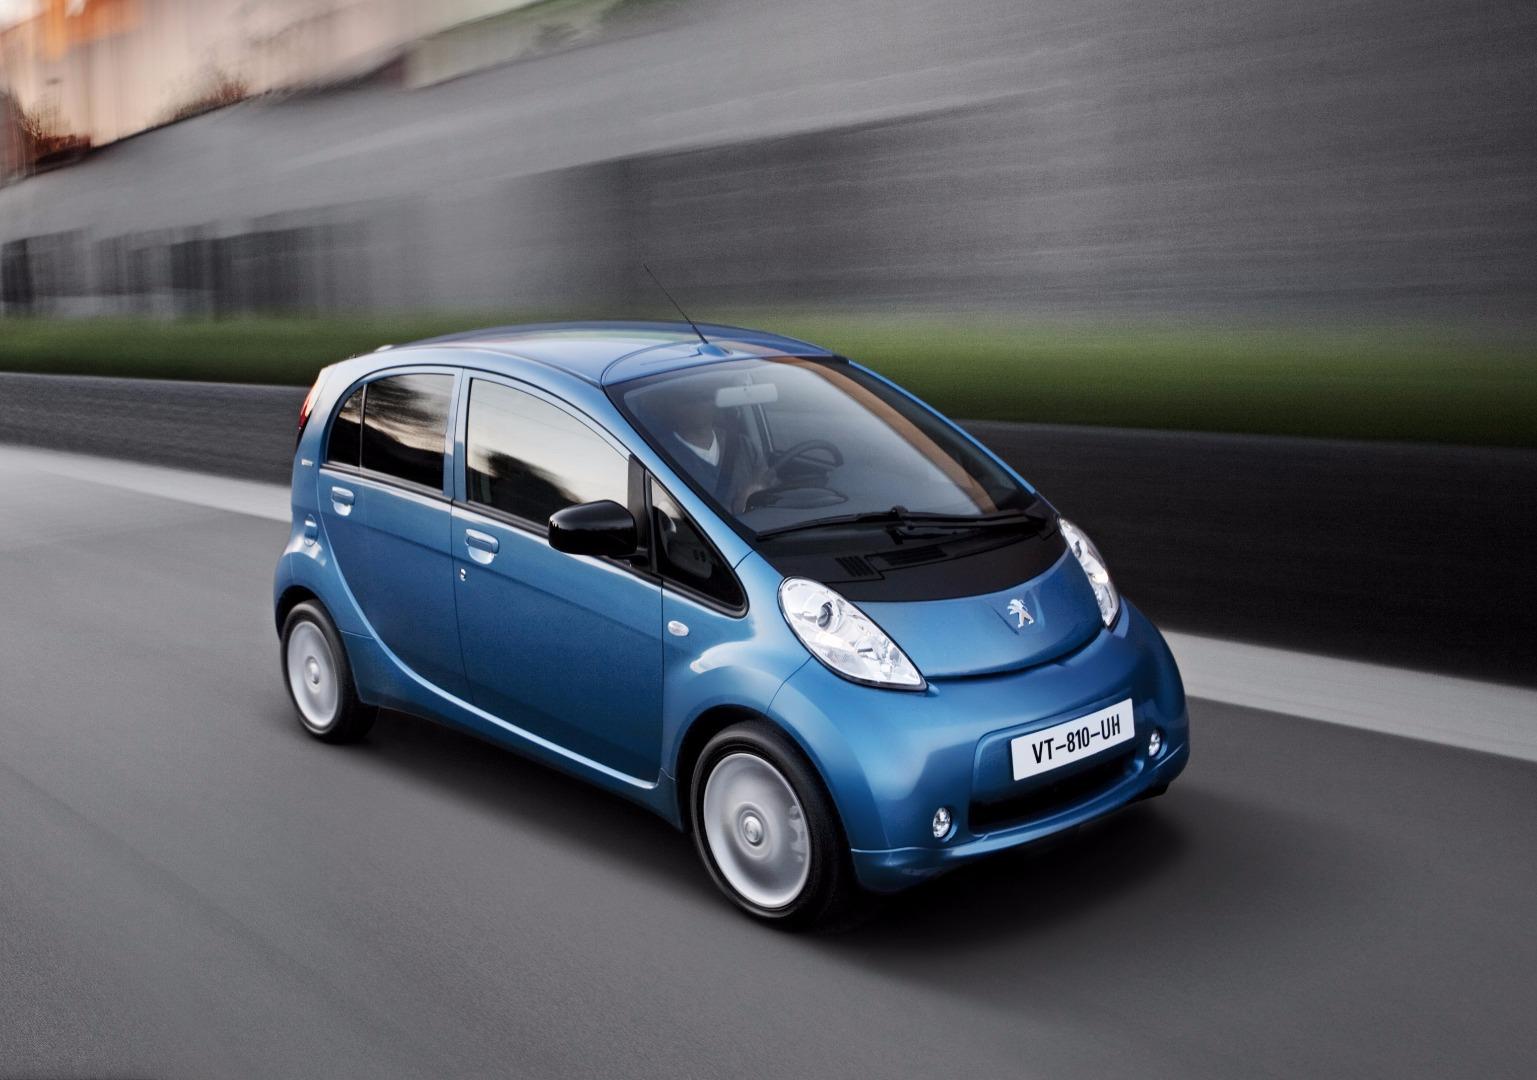 News Psa Peugeot Citroen To Develop Evs With Dongfeng Motors